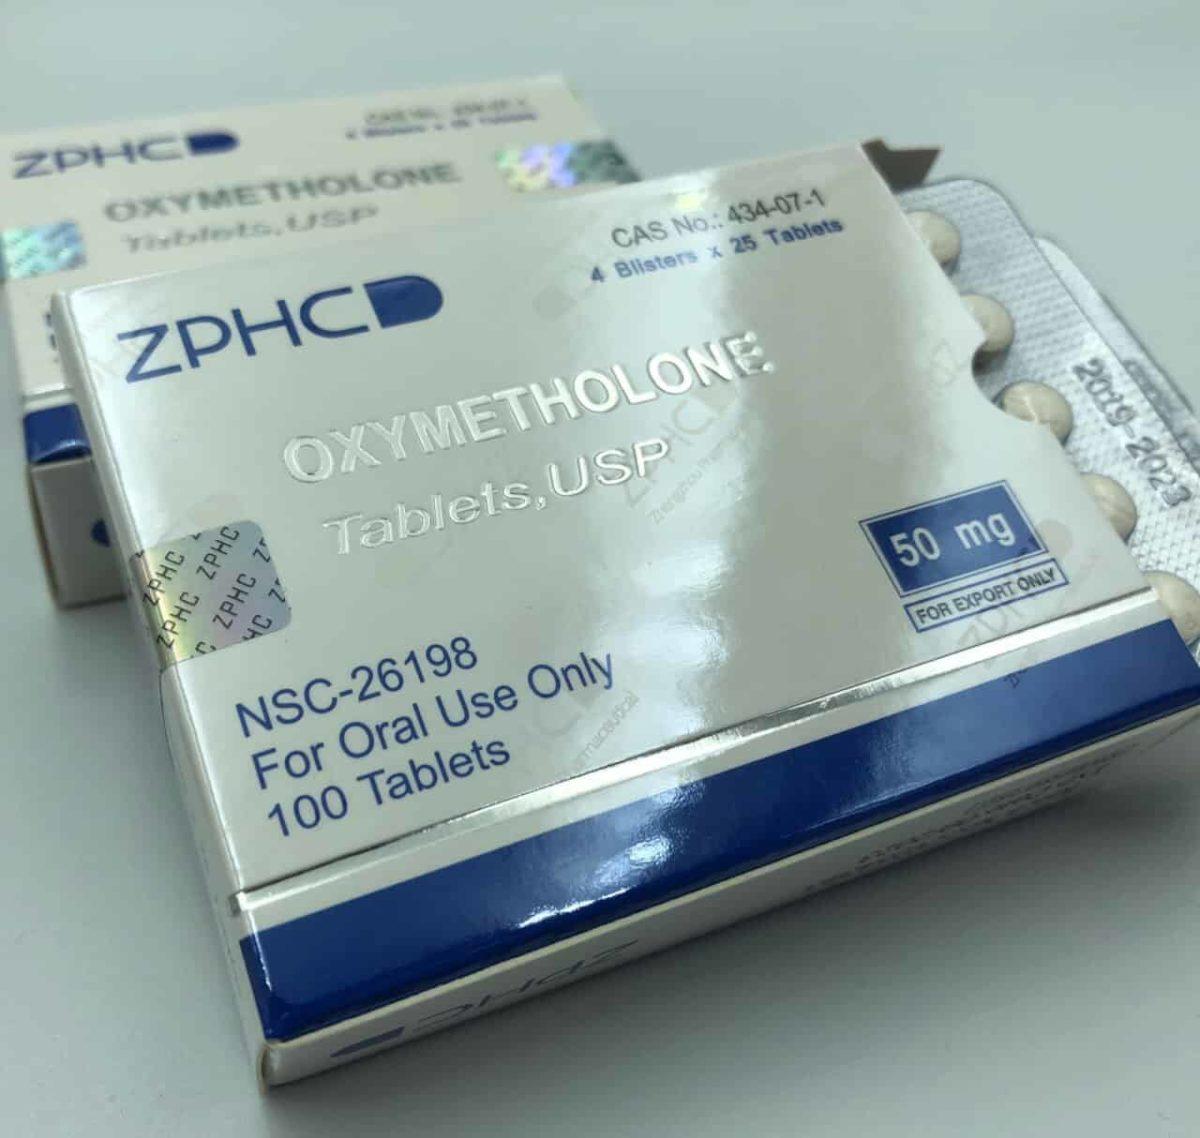 USA Domestic Oxymetholone ZPHC 50mg, 100tabs